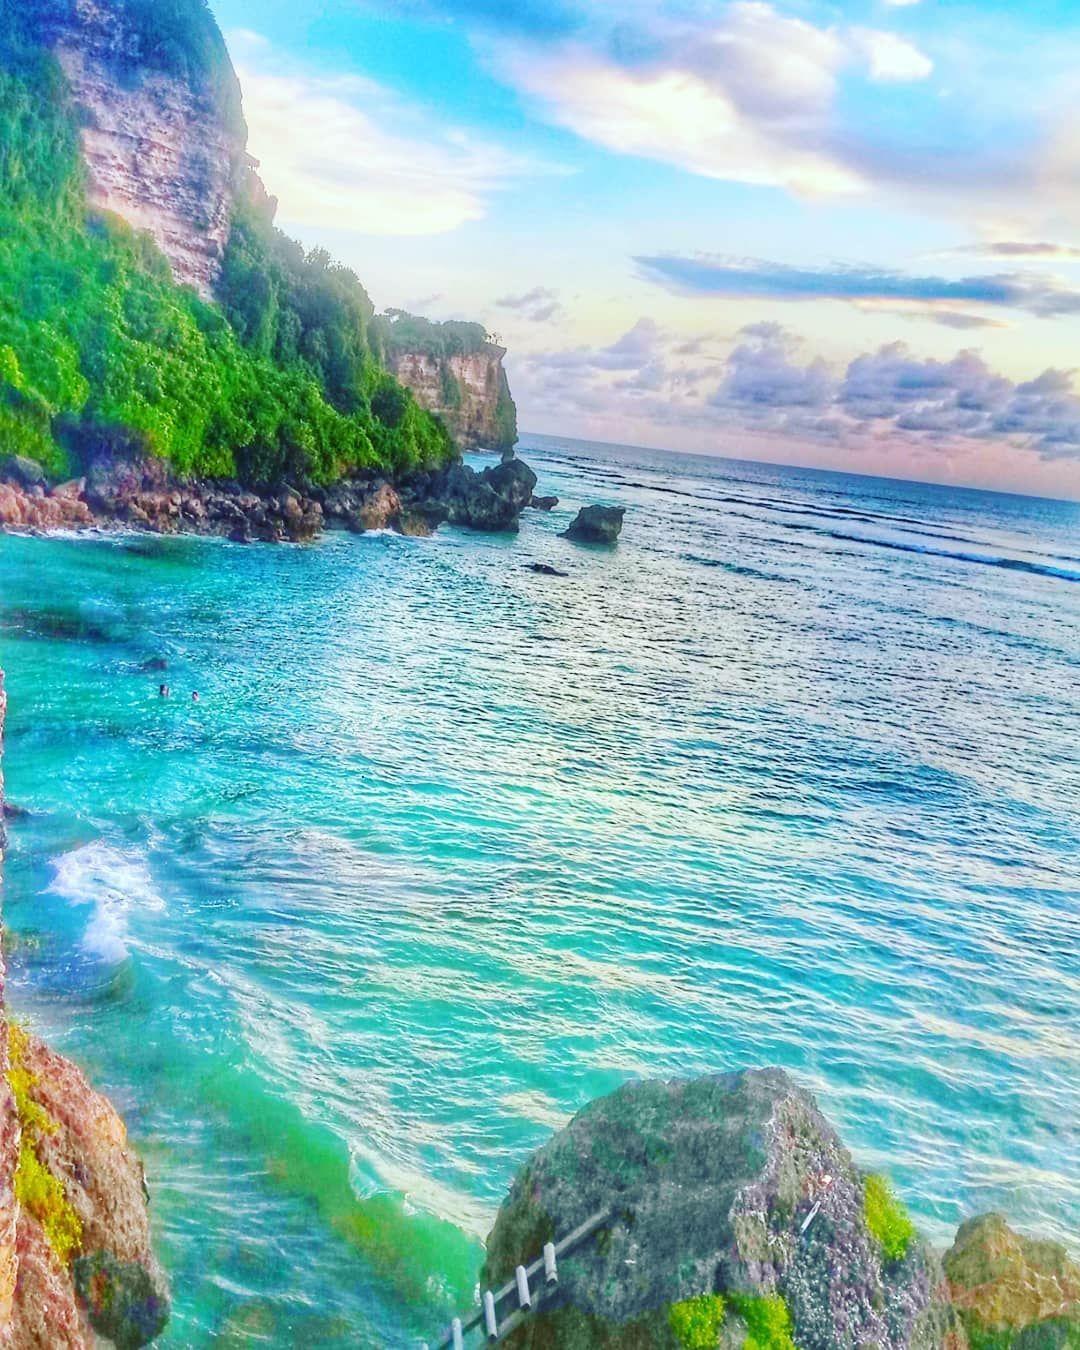 Photo of Bali By umangyadav16